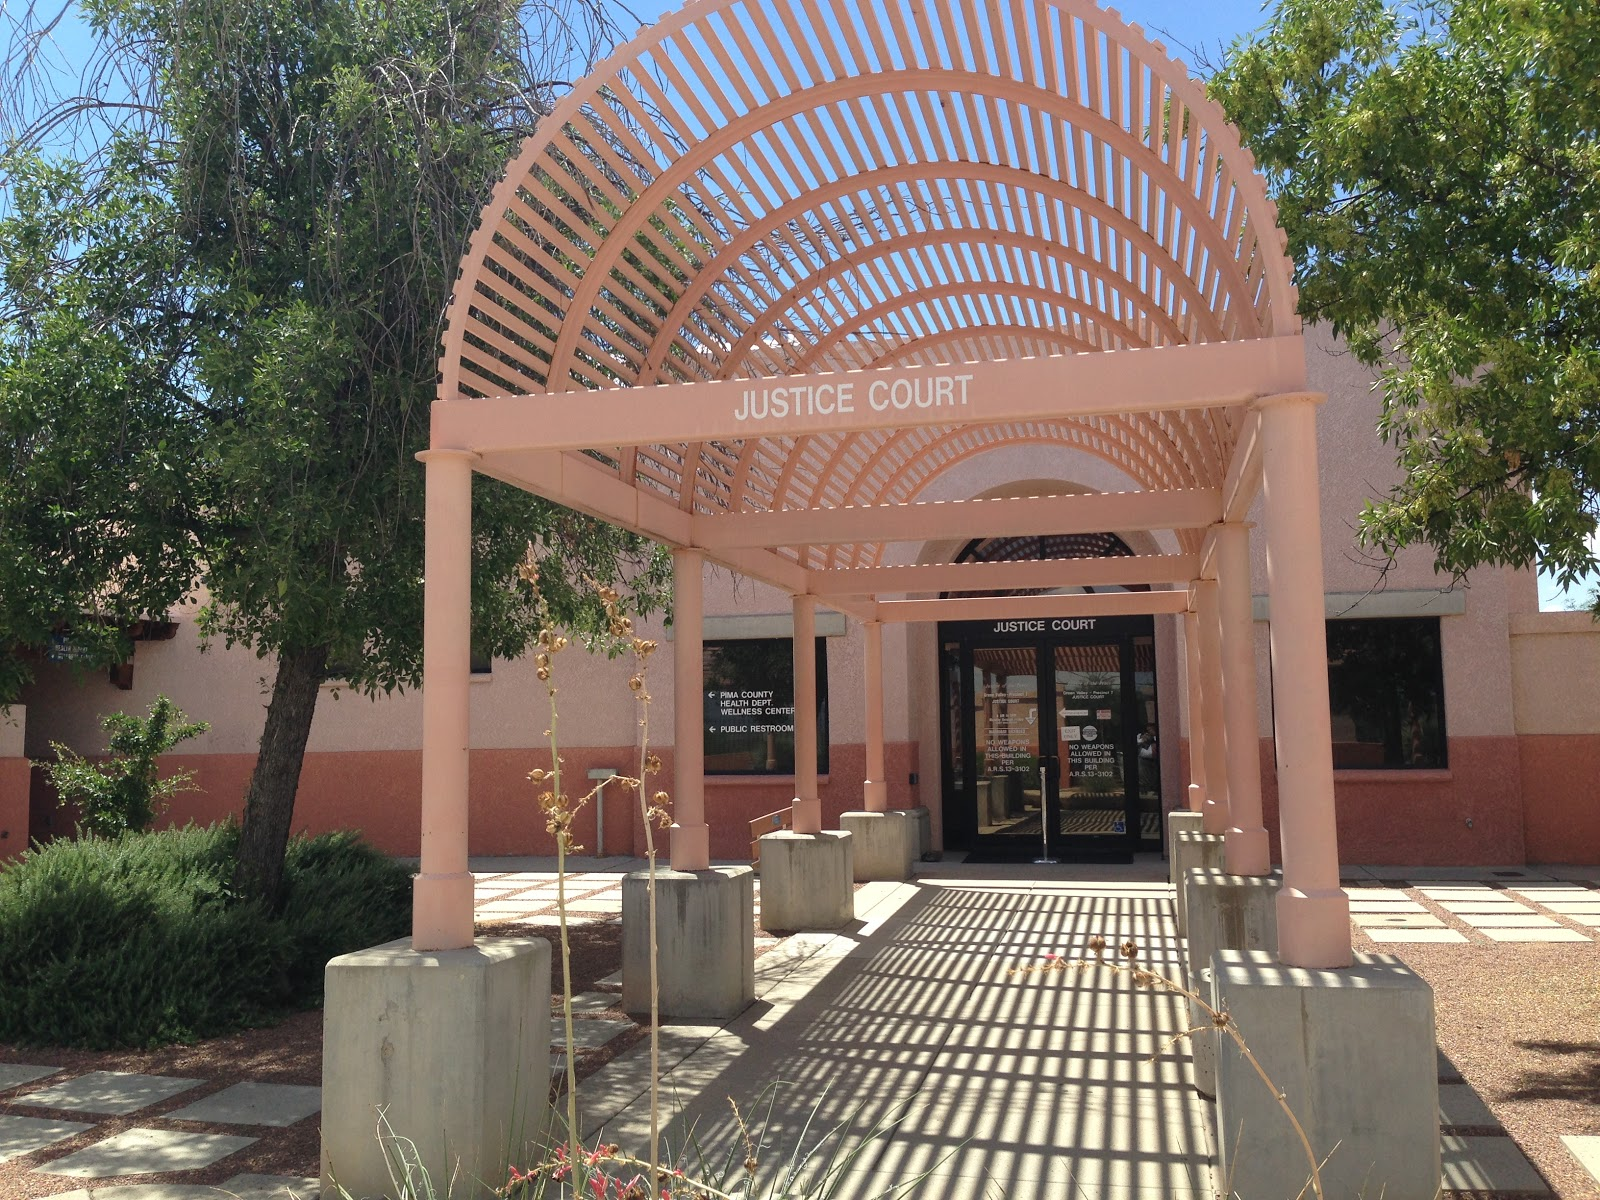 Arizona Real Estate Blog: Green Valley Justice Court - Pima